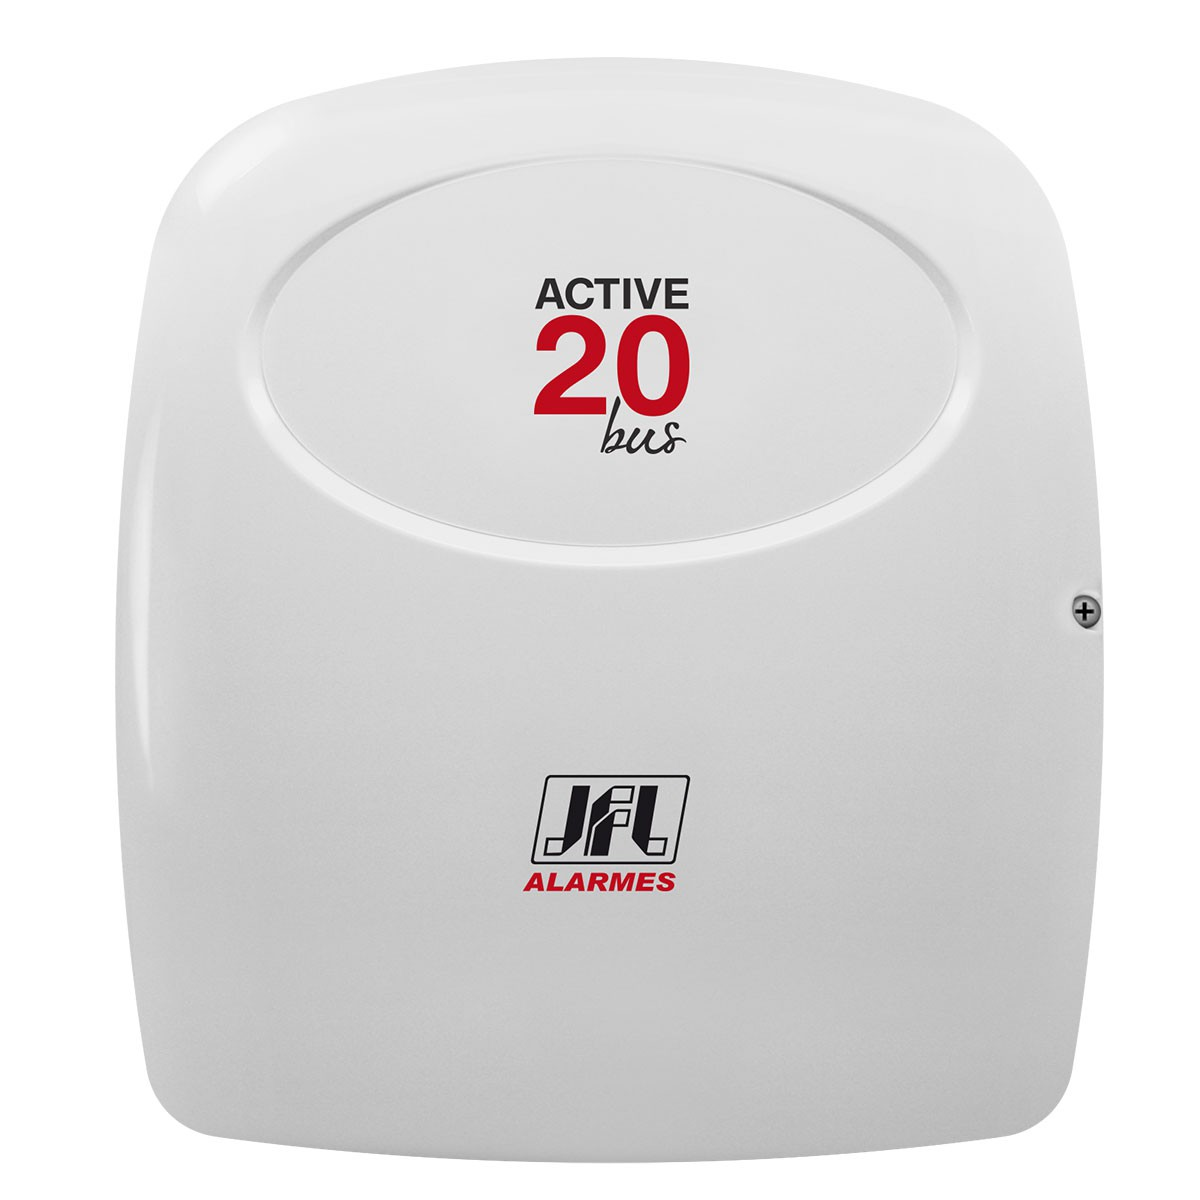 Central de Alarme Monitorada 32 Zonas Tecnologia Bus Active 20 Bus Jfl